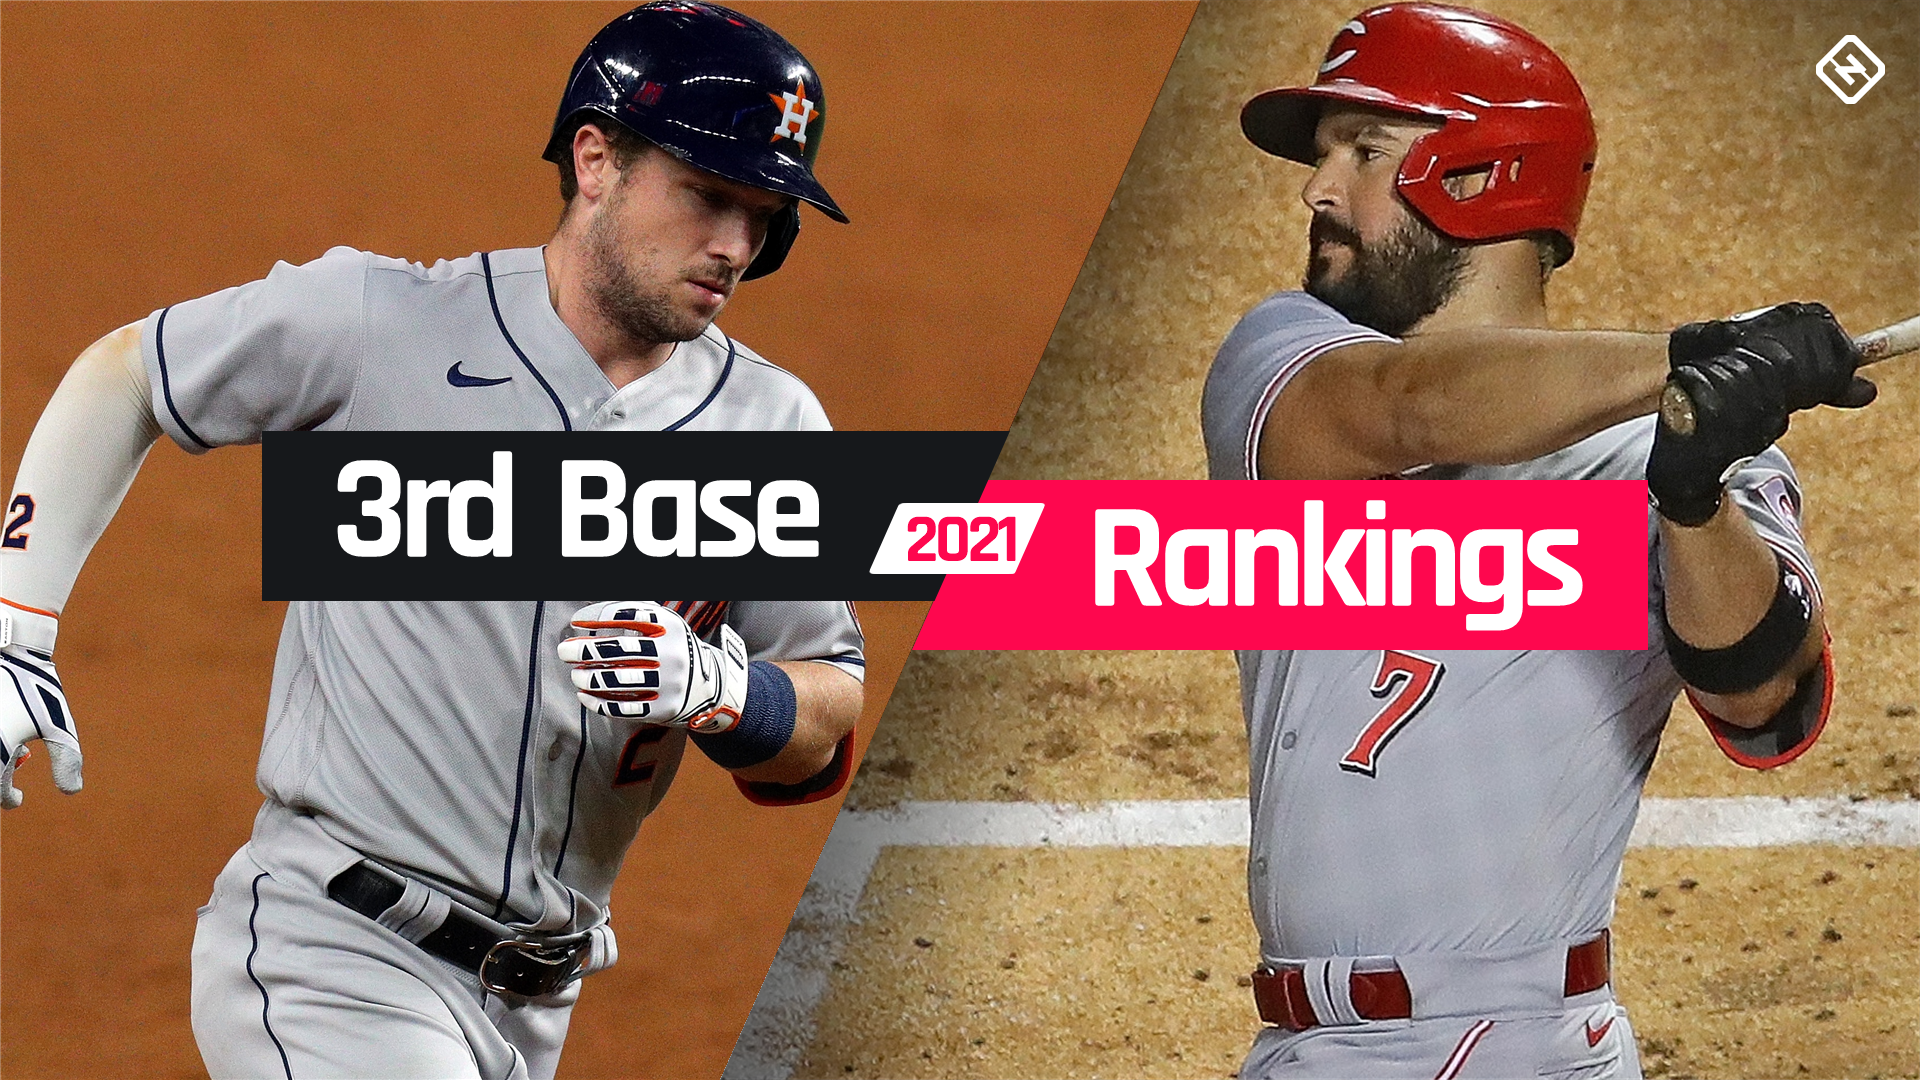 Fantasy Baseball 3B Rankings: Third Base Tiers, Sleepers, Draft Strategy